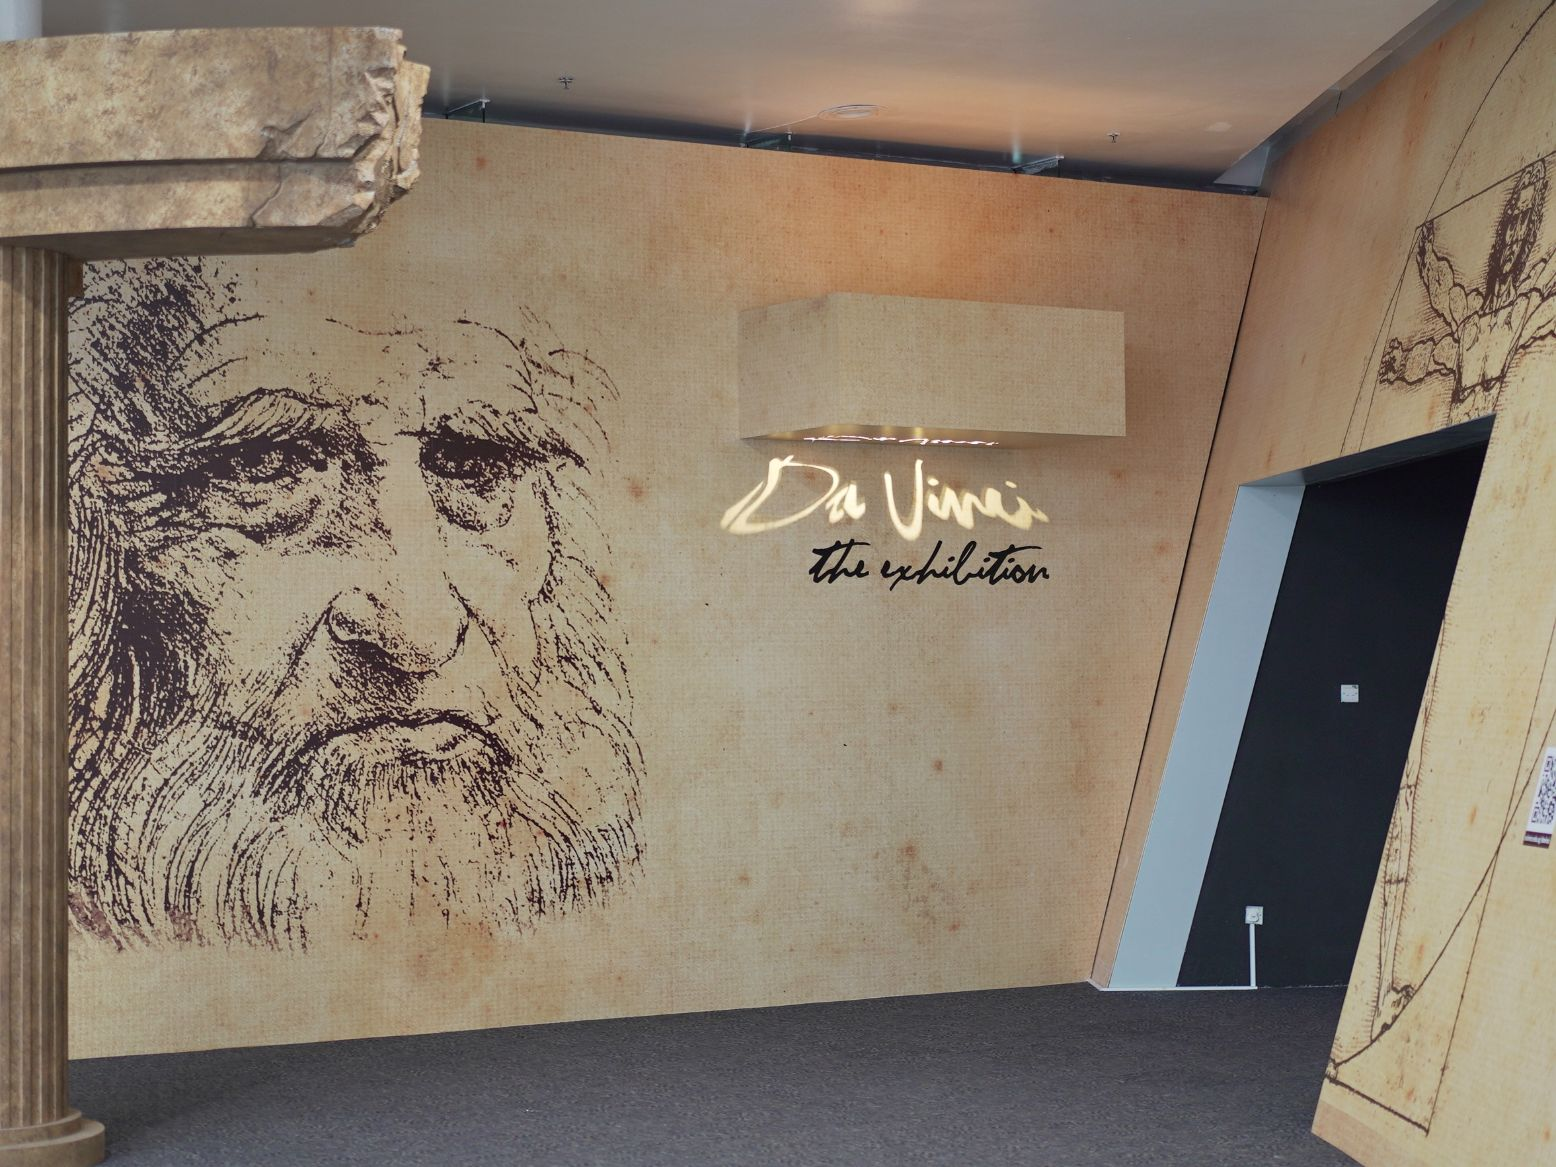 Da-Vinci-Exhibition-Singapore-Science-Center